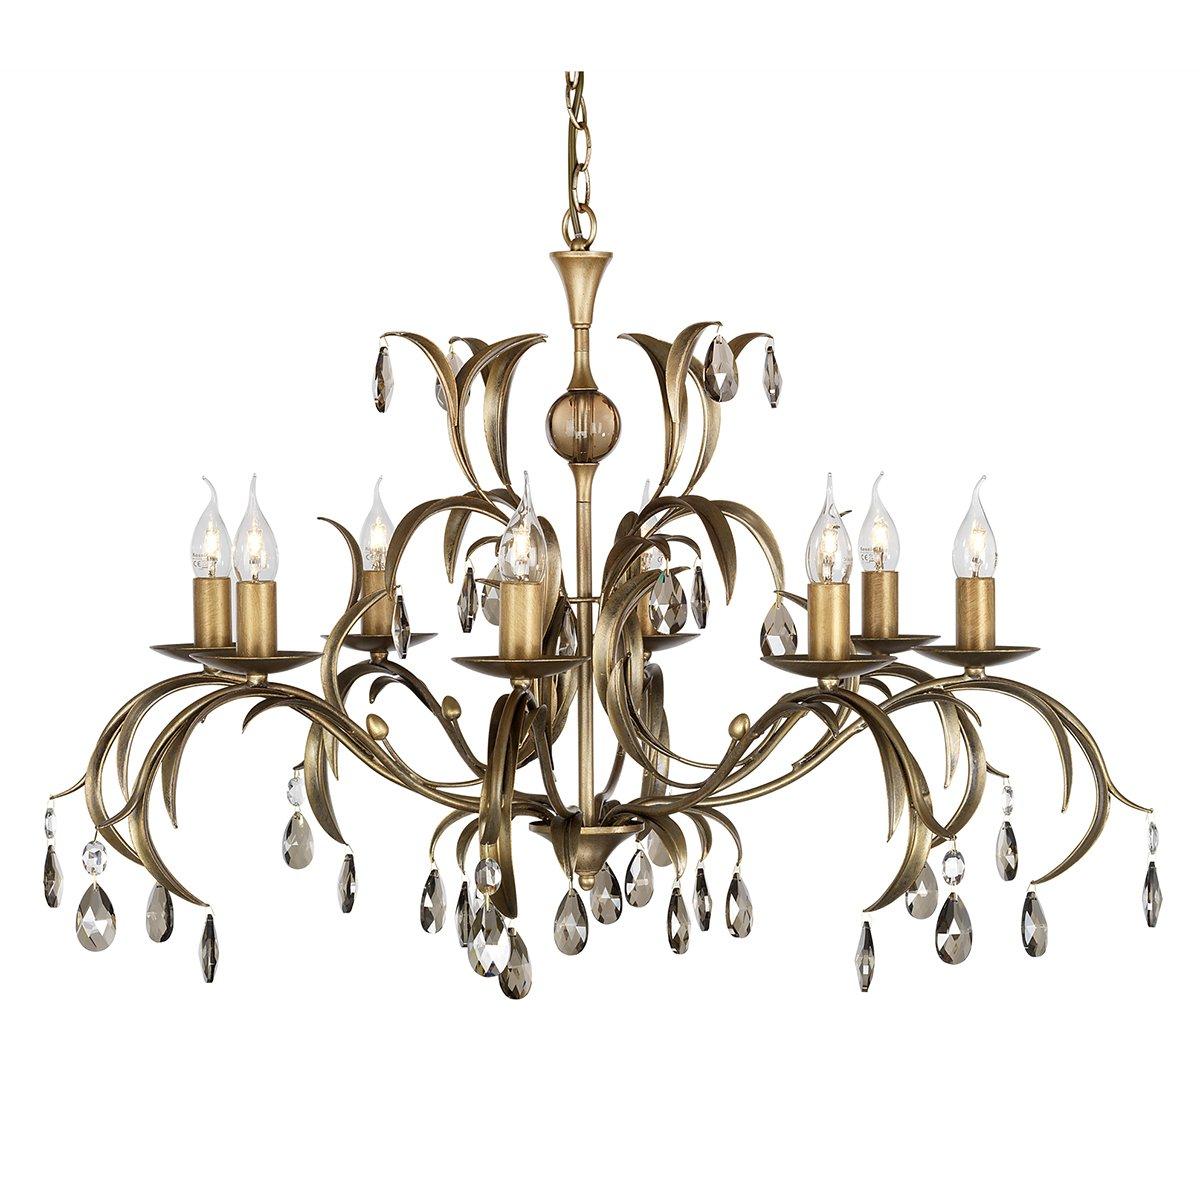 Elstead Lighting Wandlampe Lily 8 Licht Kronleuchter Deckenleuchte Antik Bronze LL8 ANT BRZ